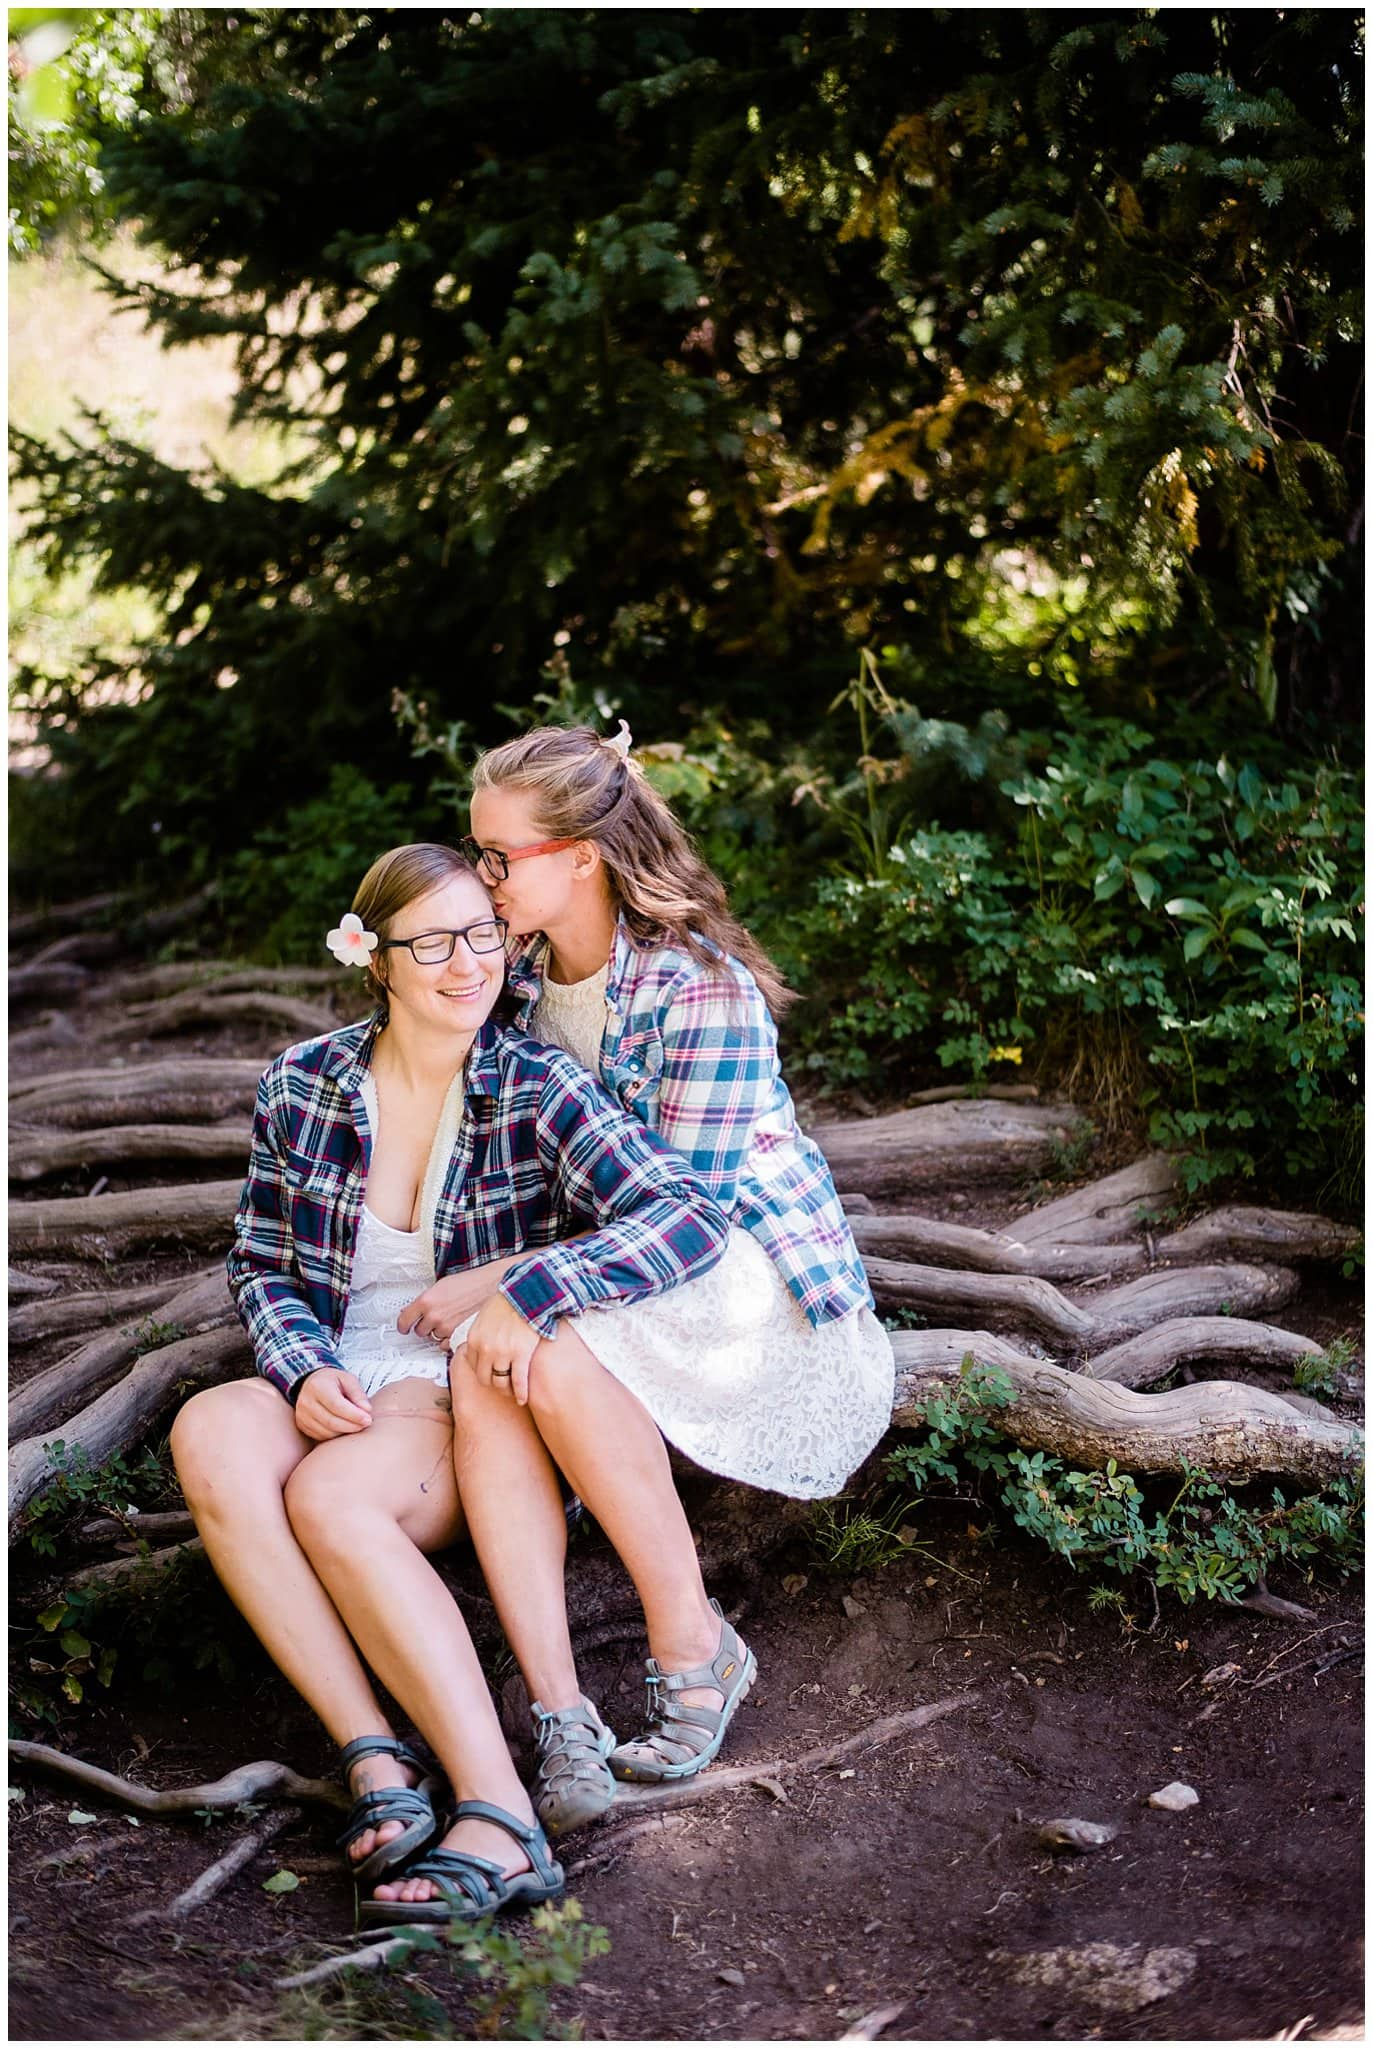 Hiking elopement photo